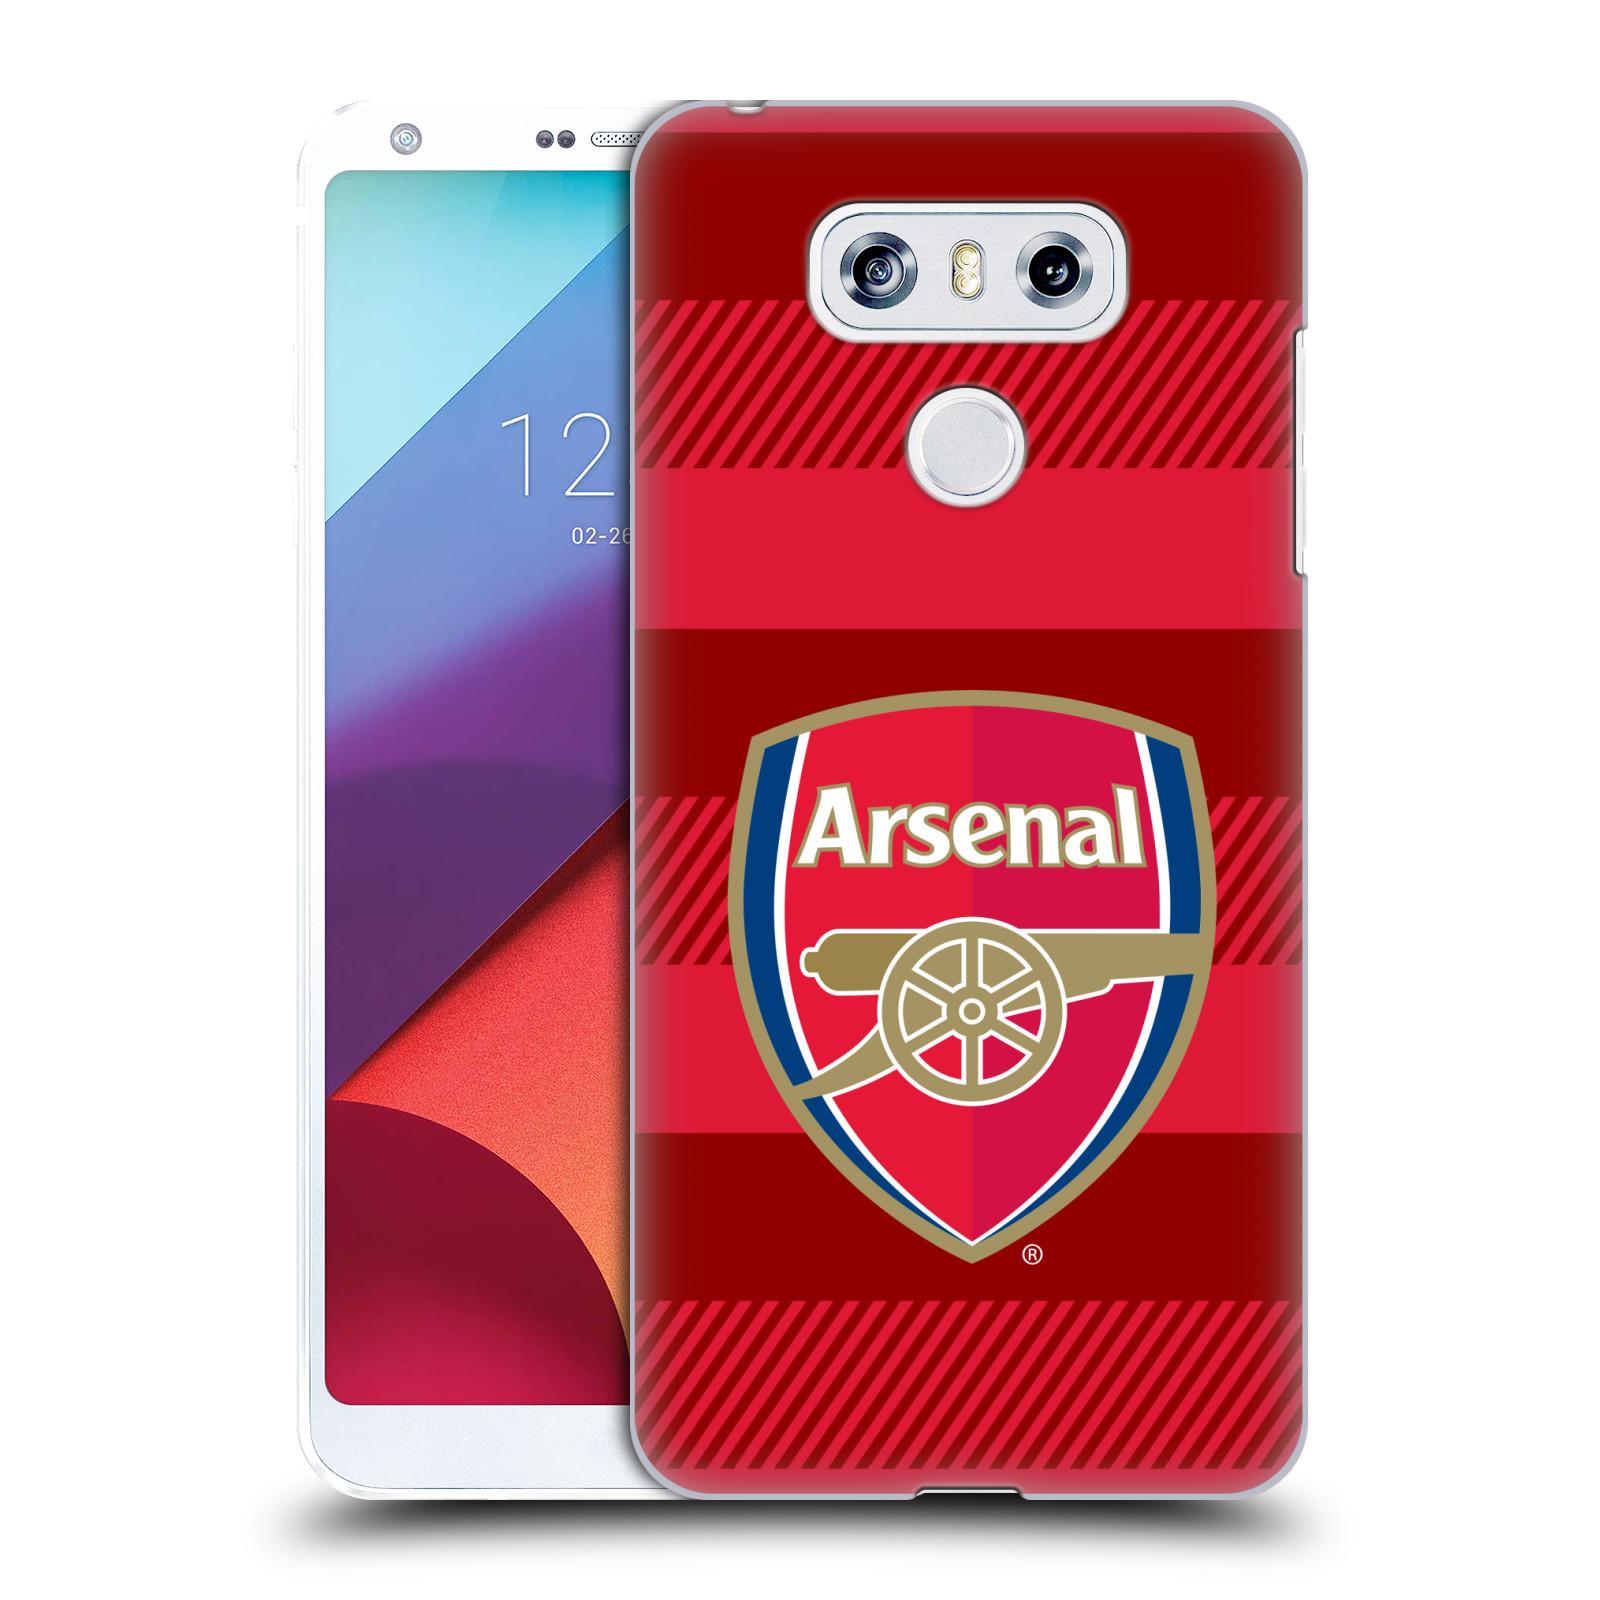 Plastové pouzdro na mobil LG G6 - Head Case - Arsenal FC - Logo s pruhy